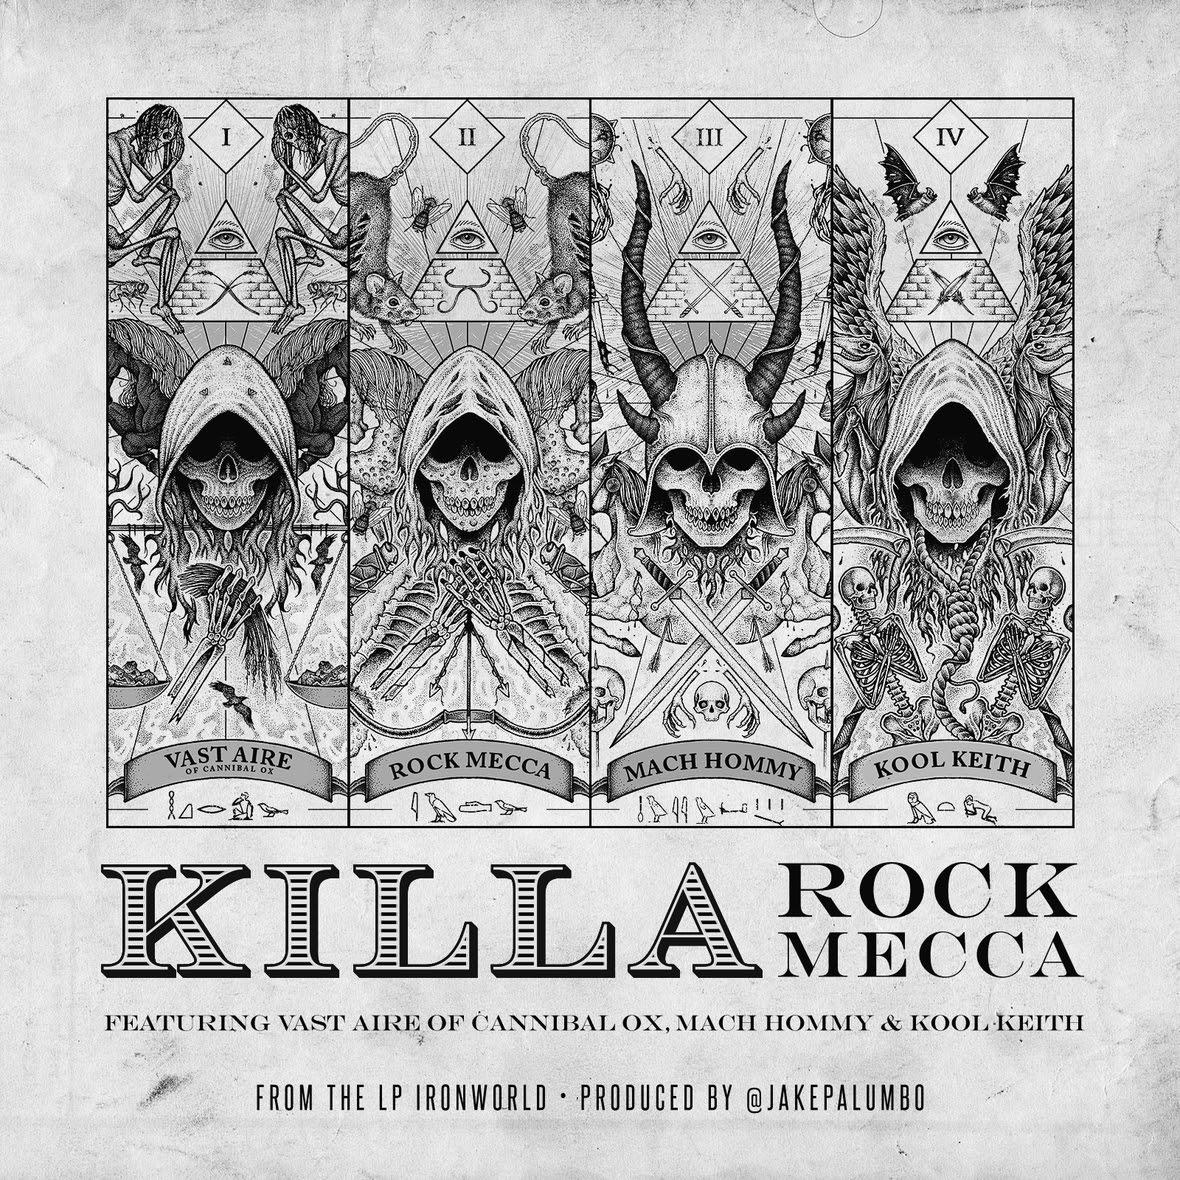 Rock Mecca ft  Vast Aire, Mach Hommy & Kool Keith - Killa (Audio